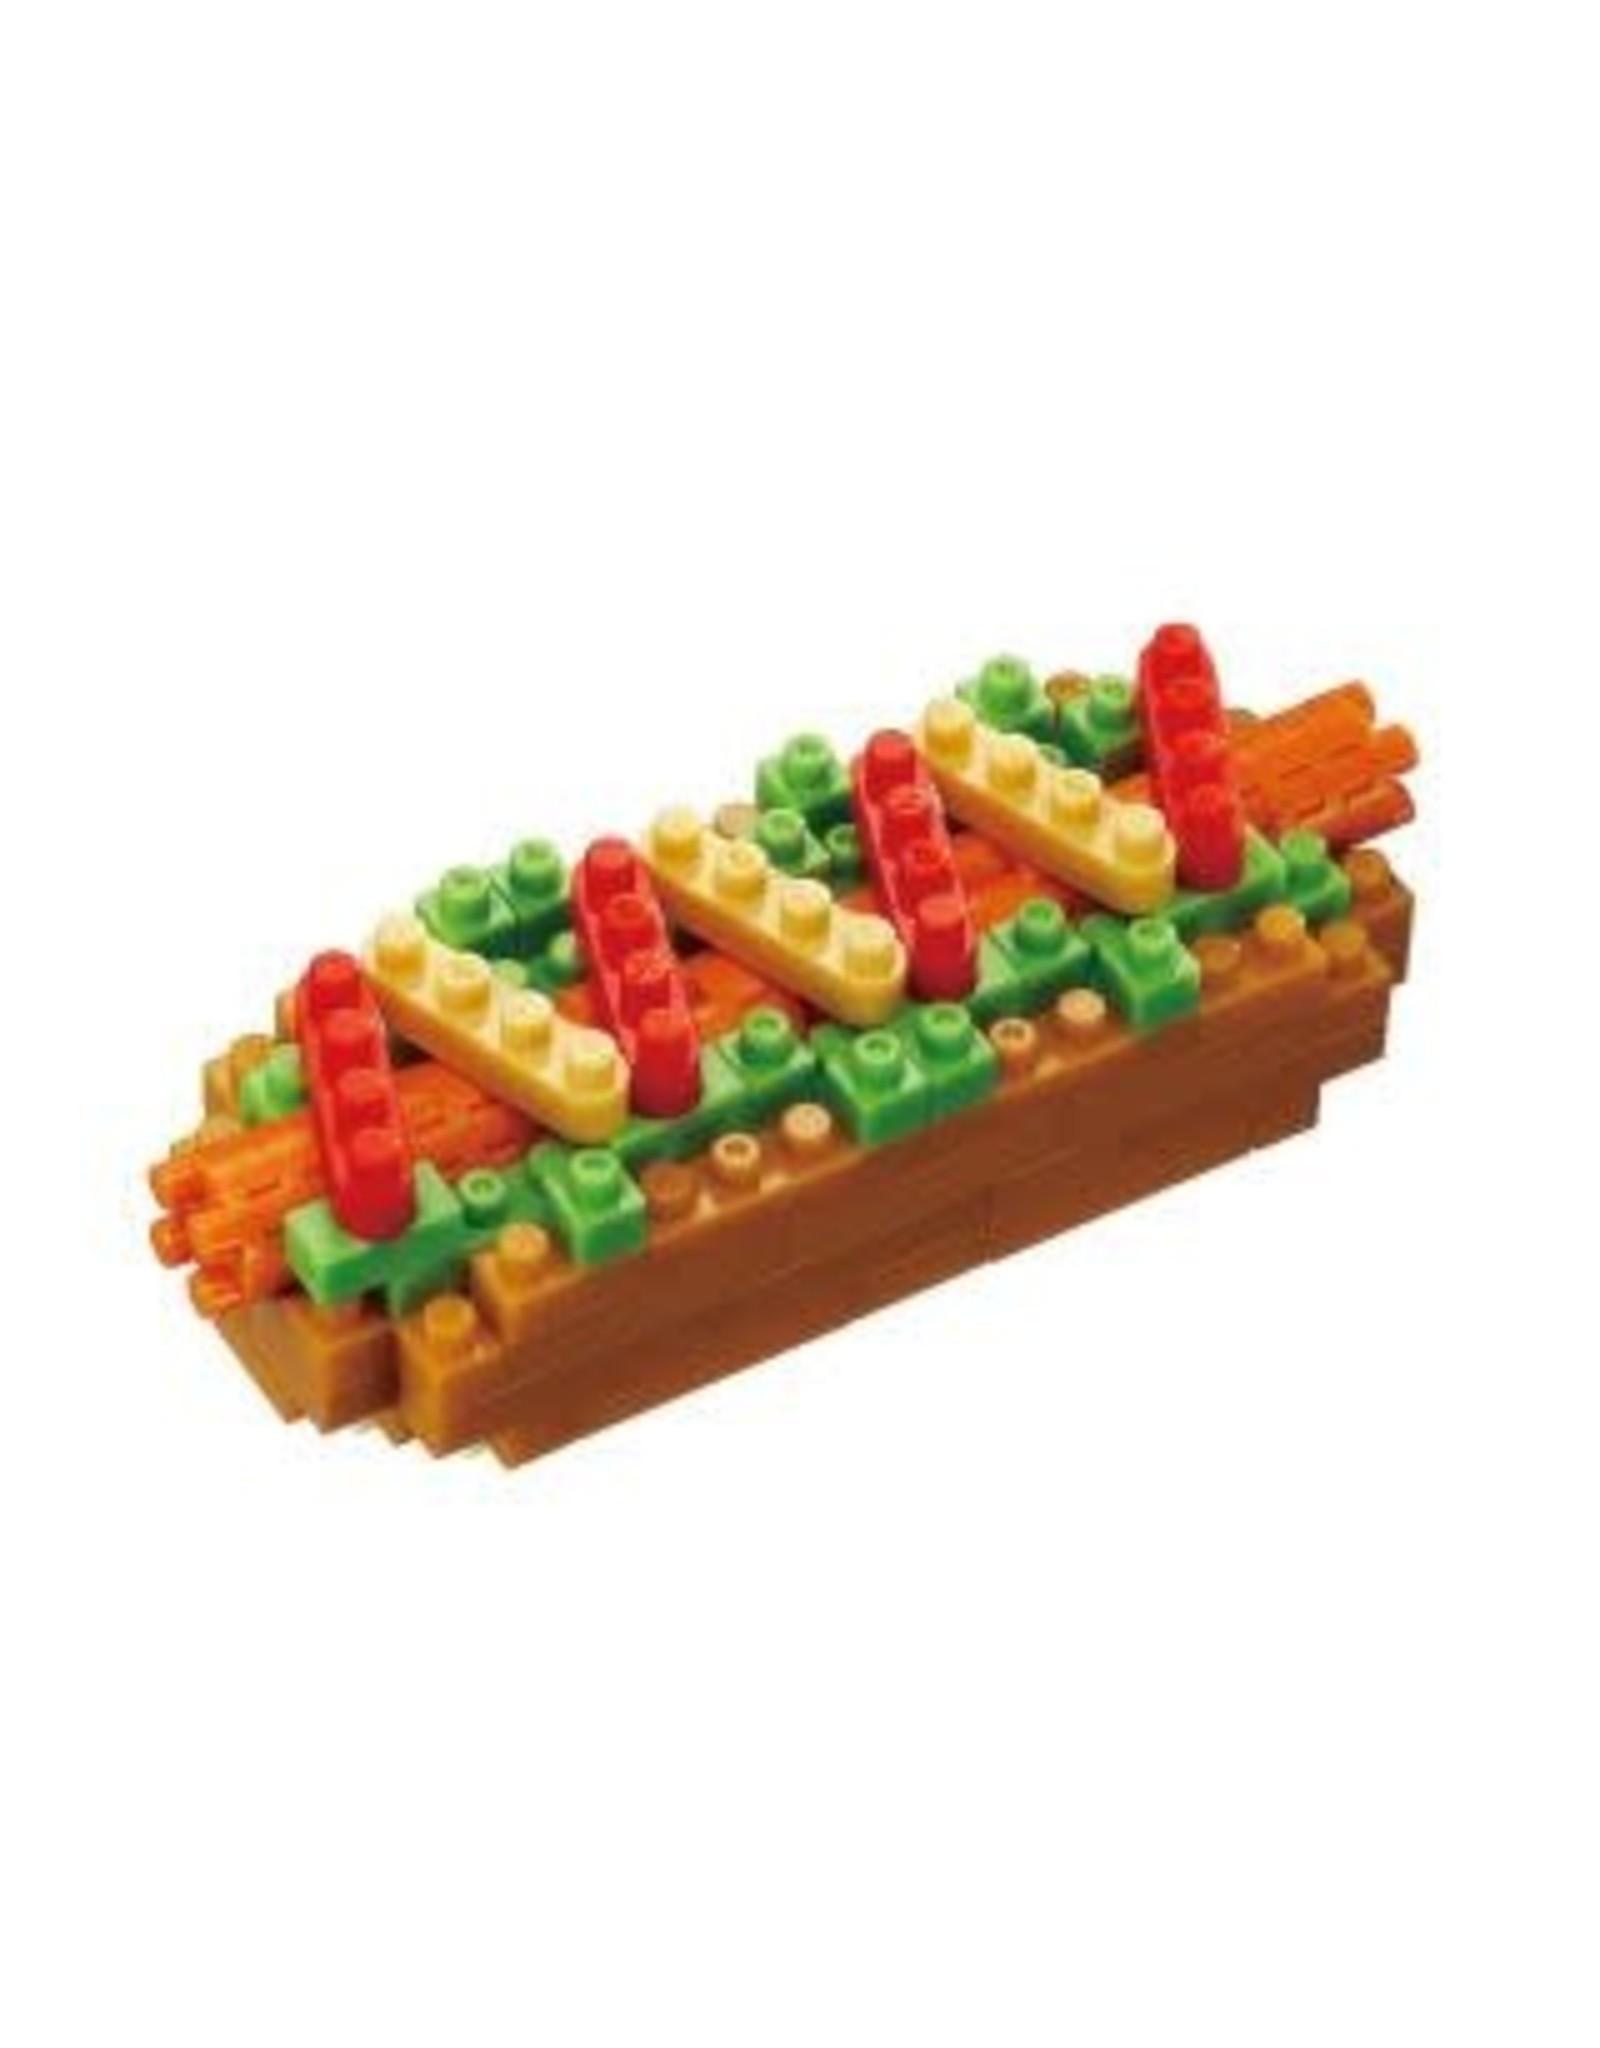 Nanoblock Hot Dog